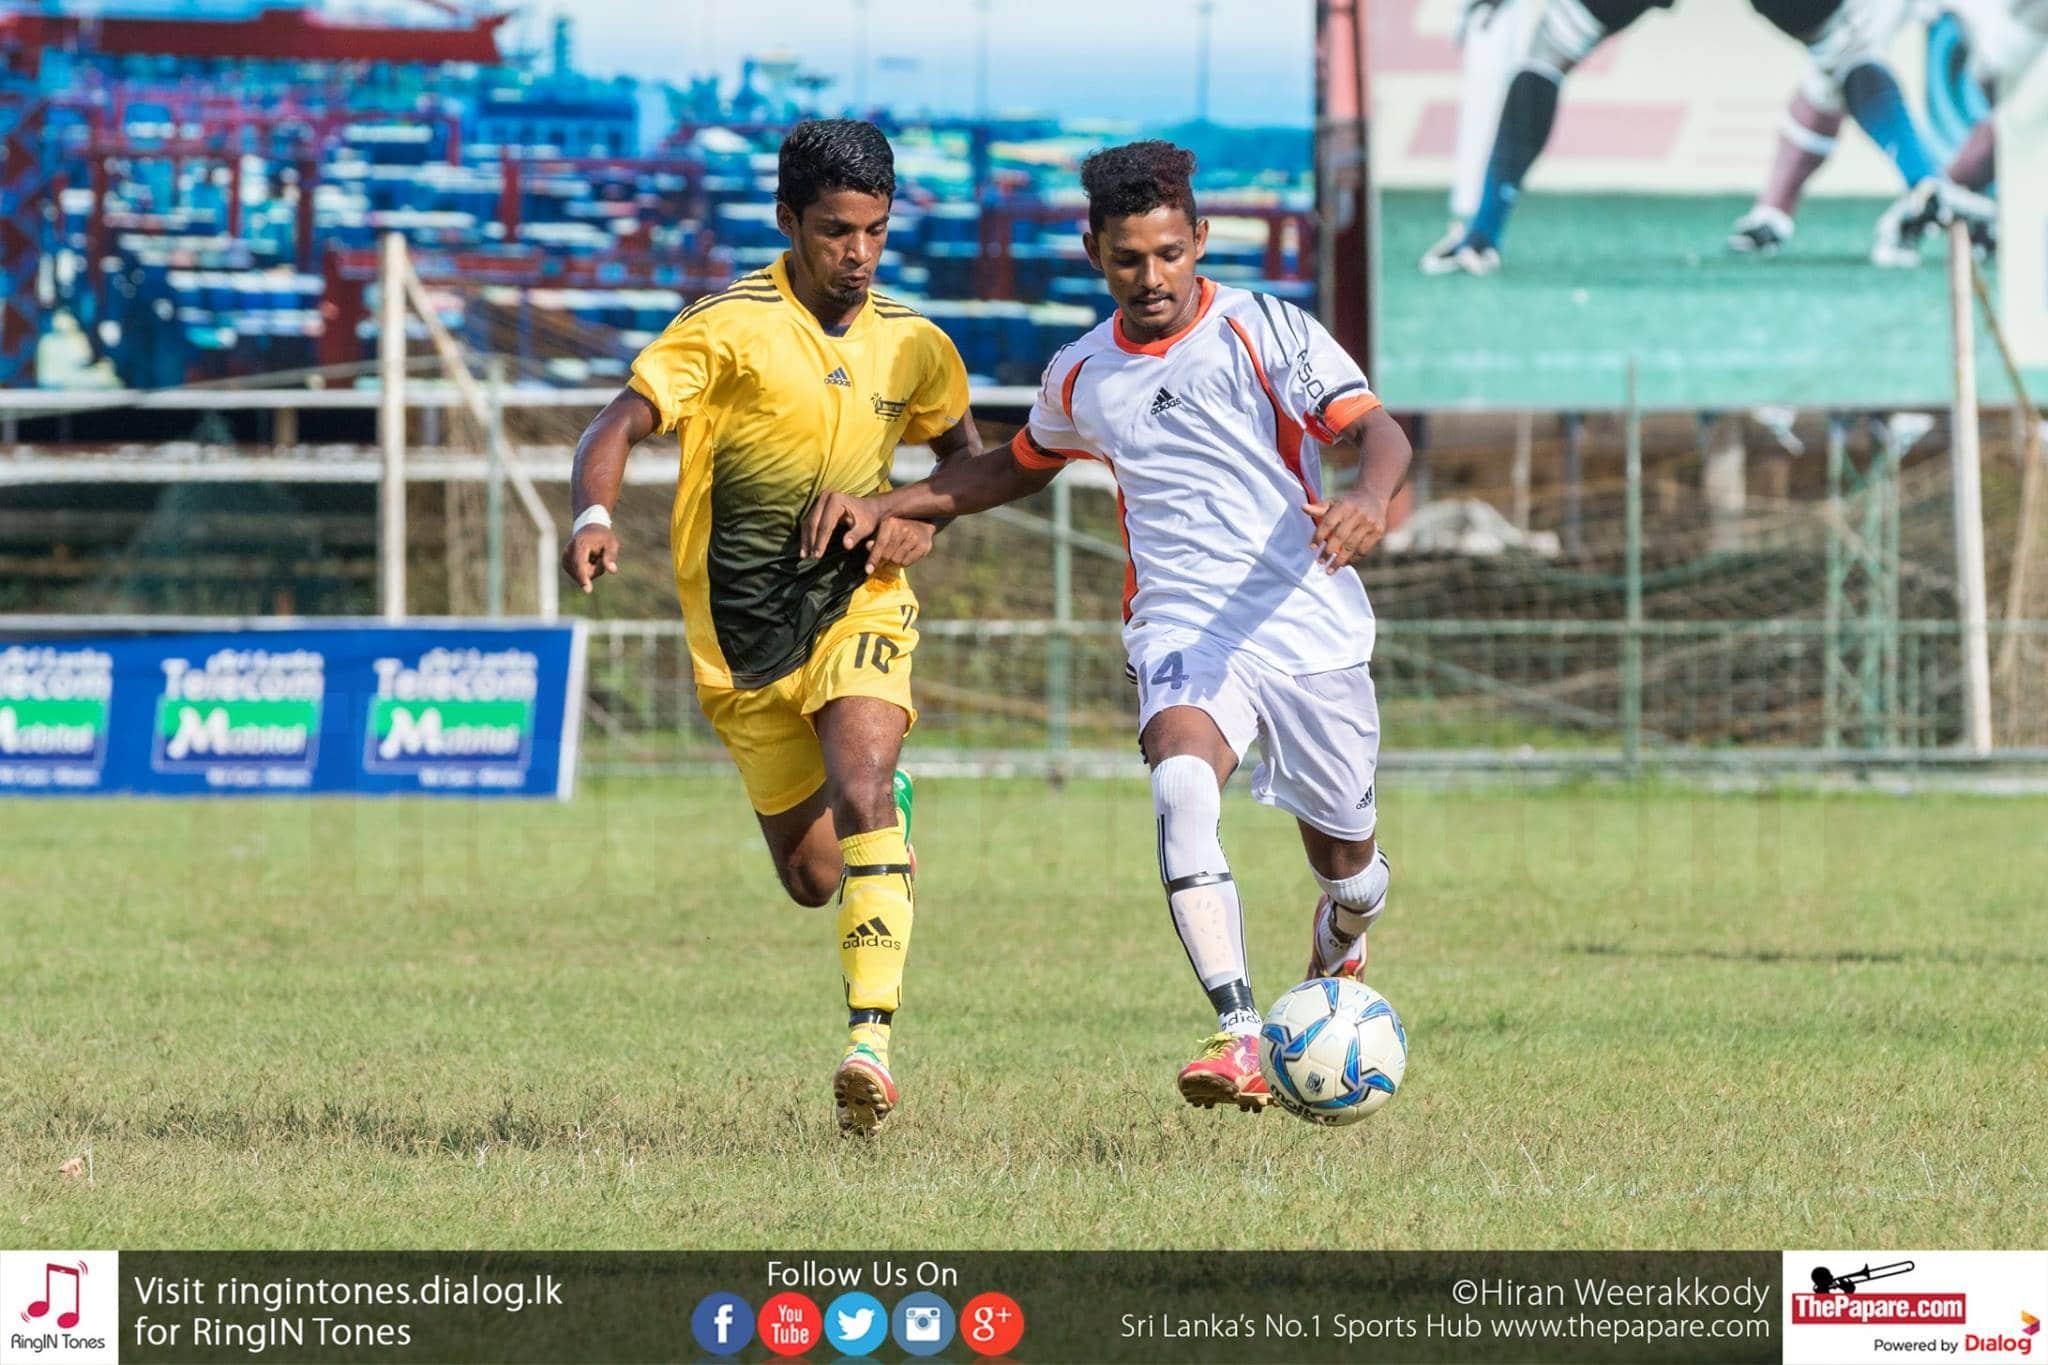 Ratnam SC v New Star (Gold Cup 2016)